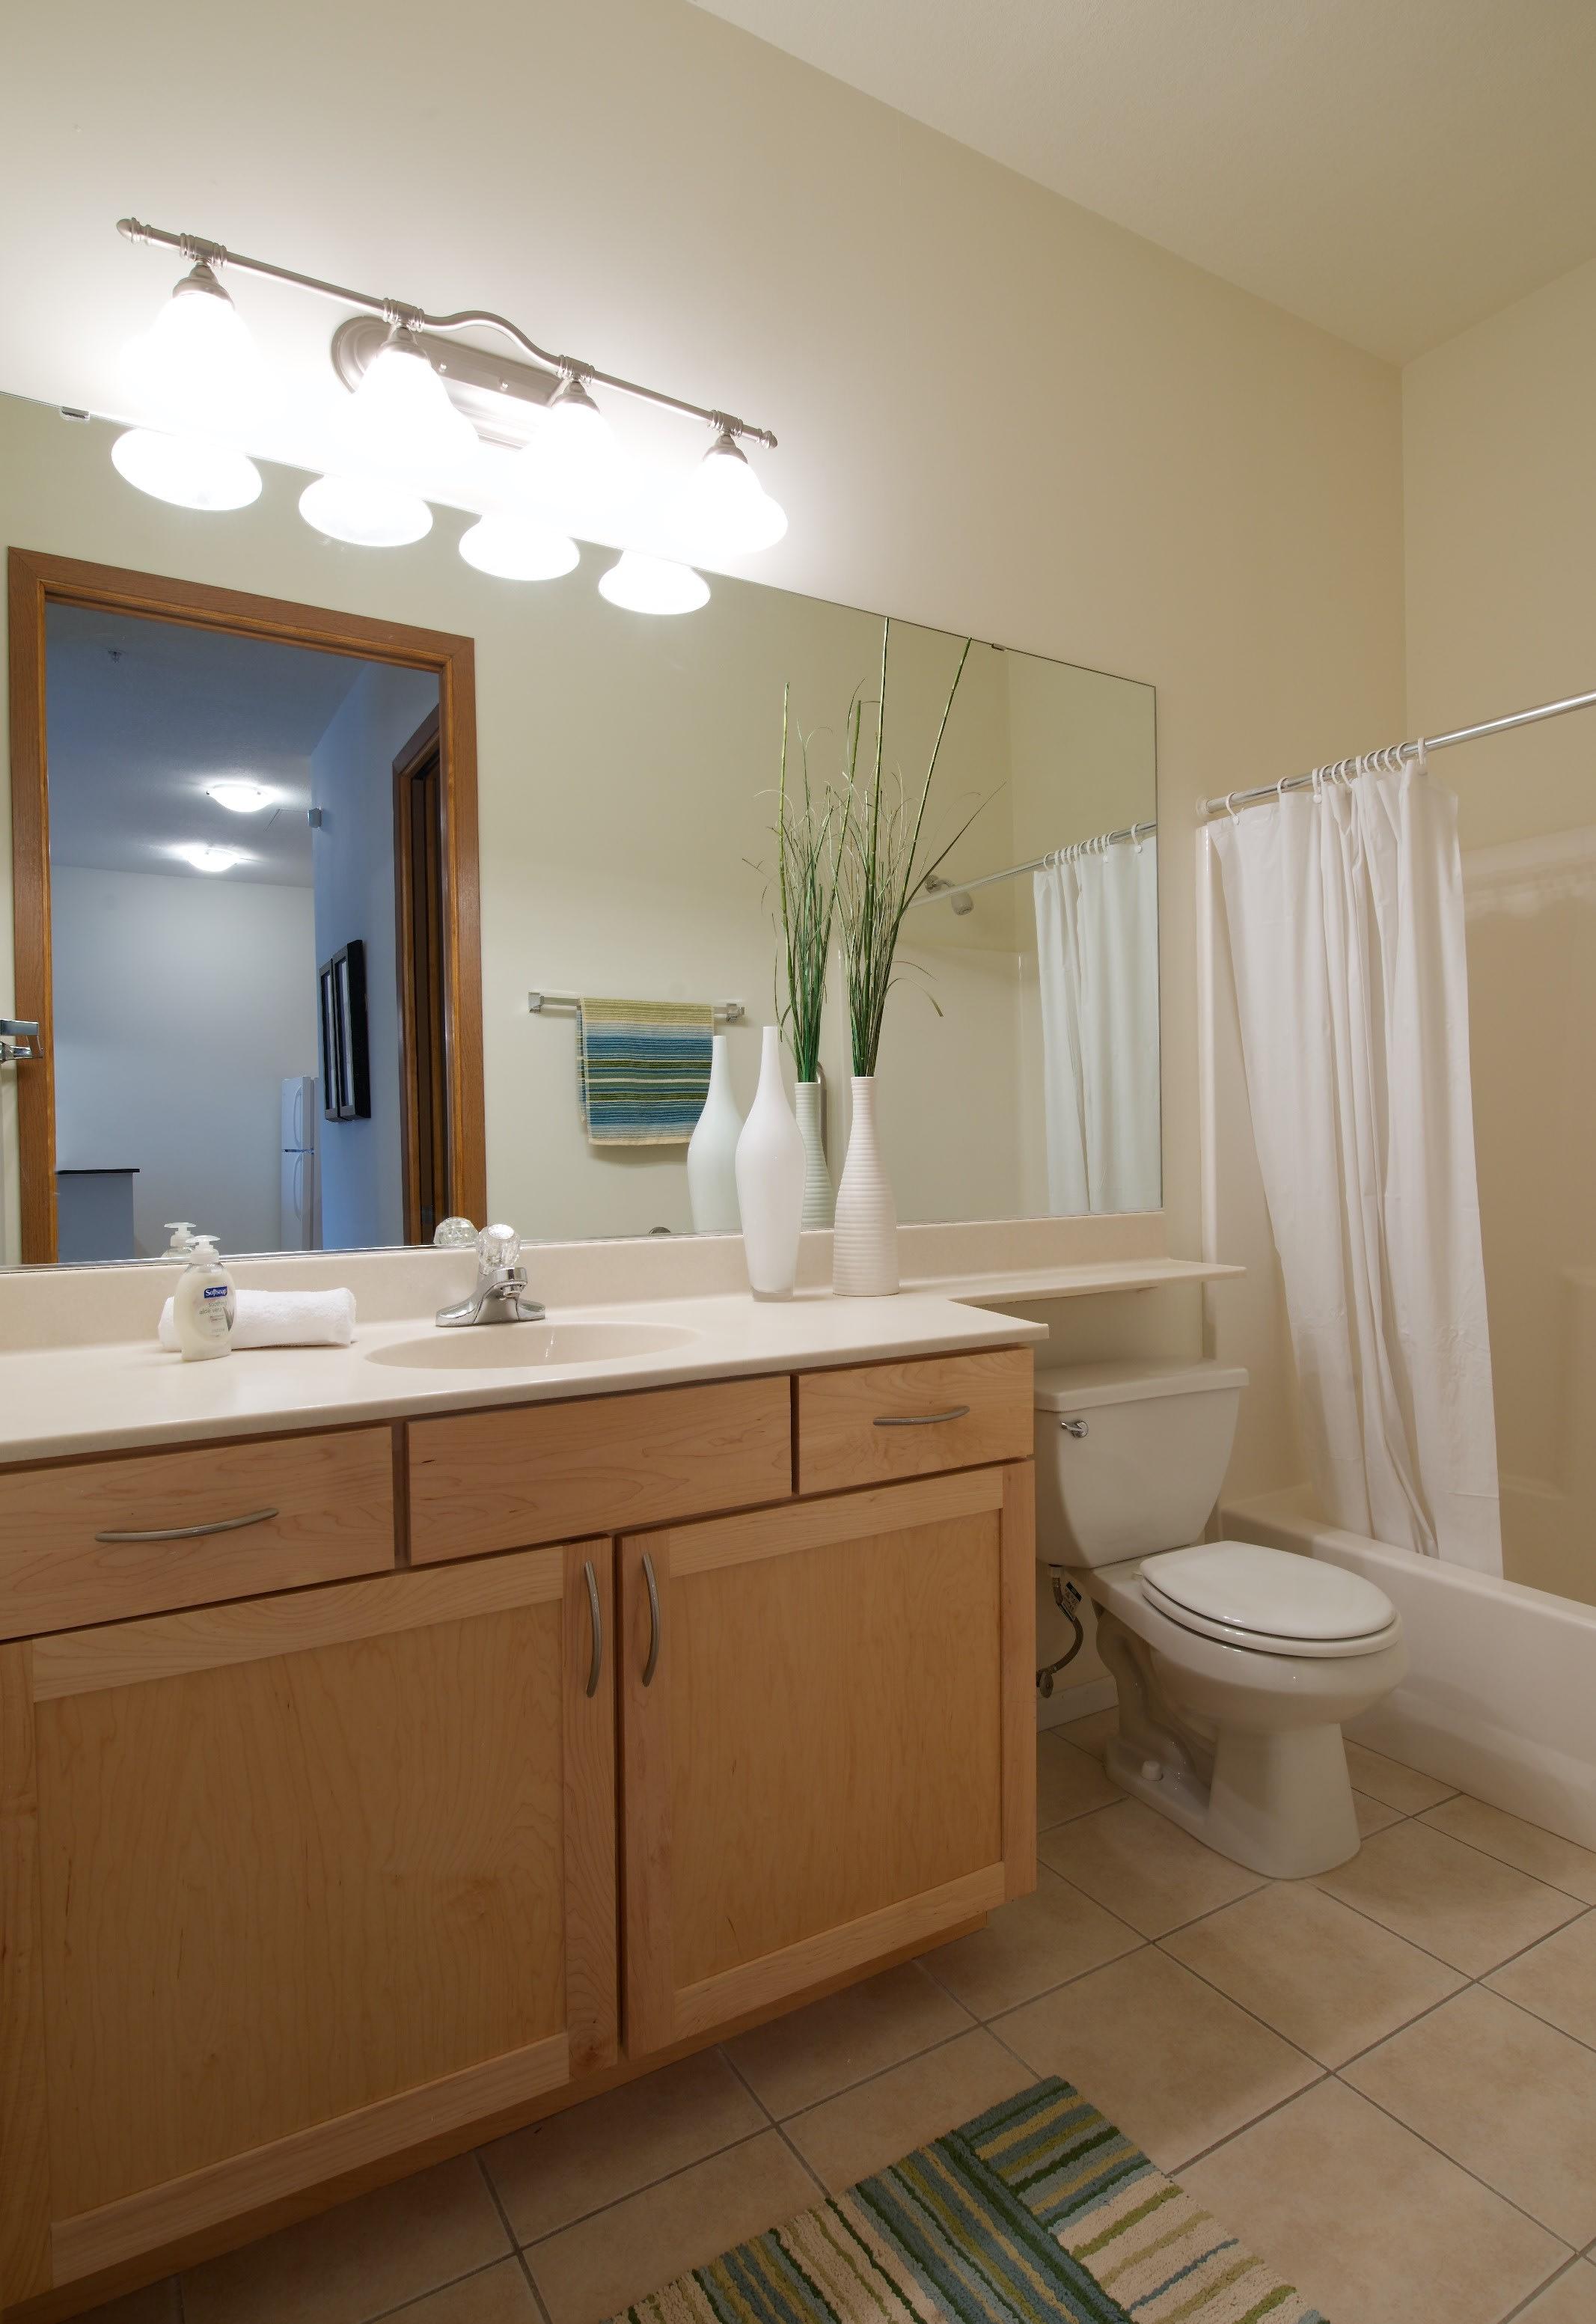 Mears Park Place Apartments in Saint Paul, MN Bathroom